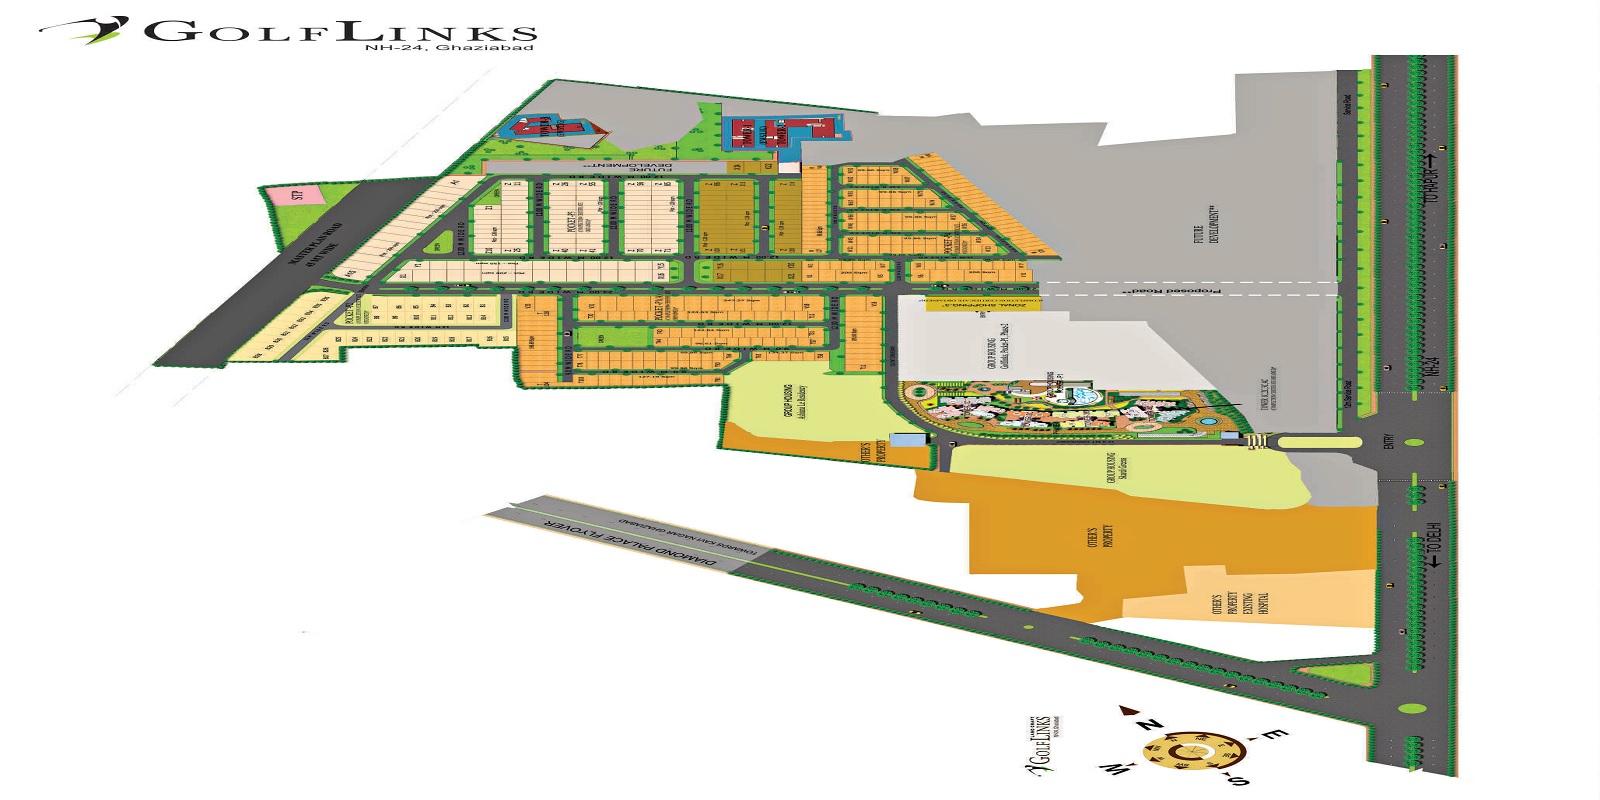 landcraft golflinks apartments project master plan image1